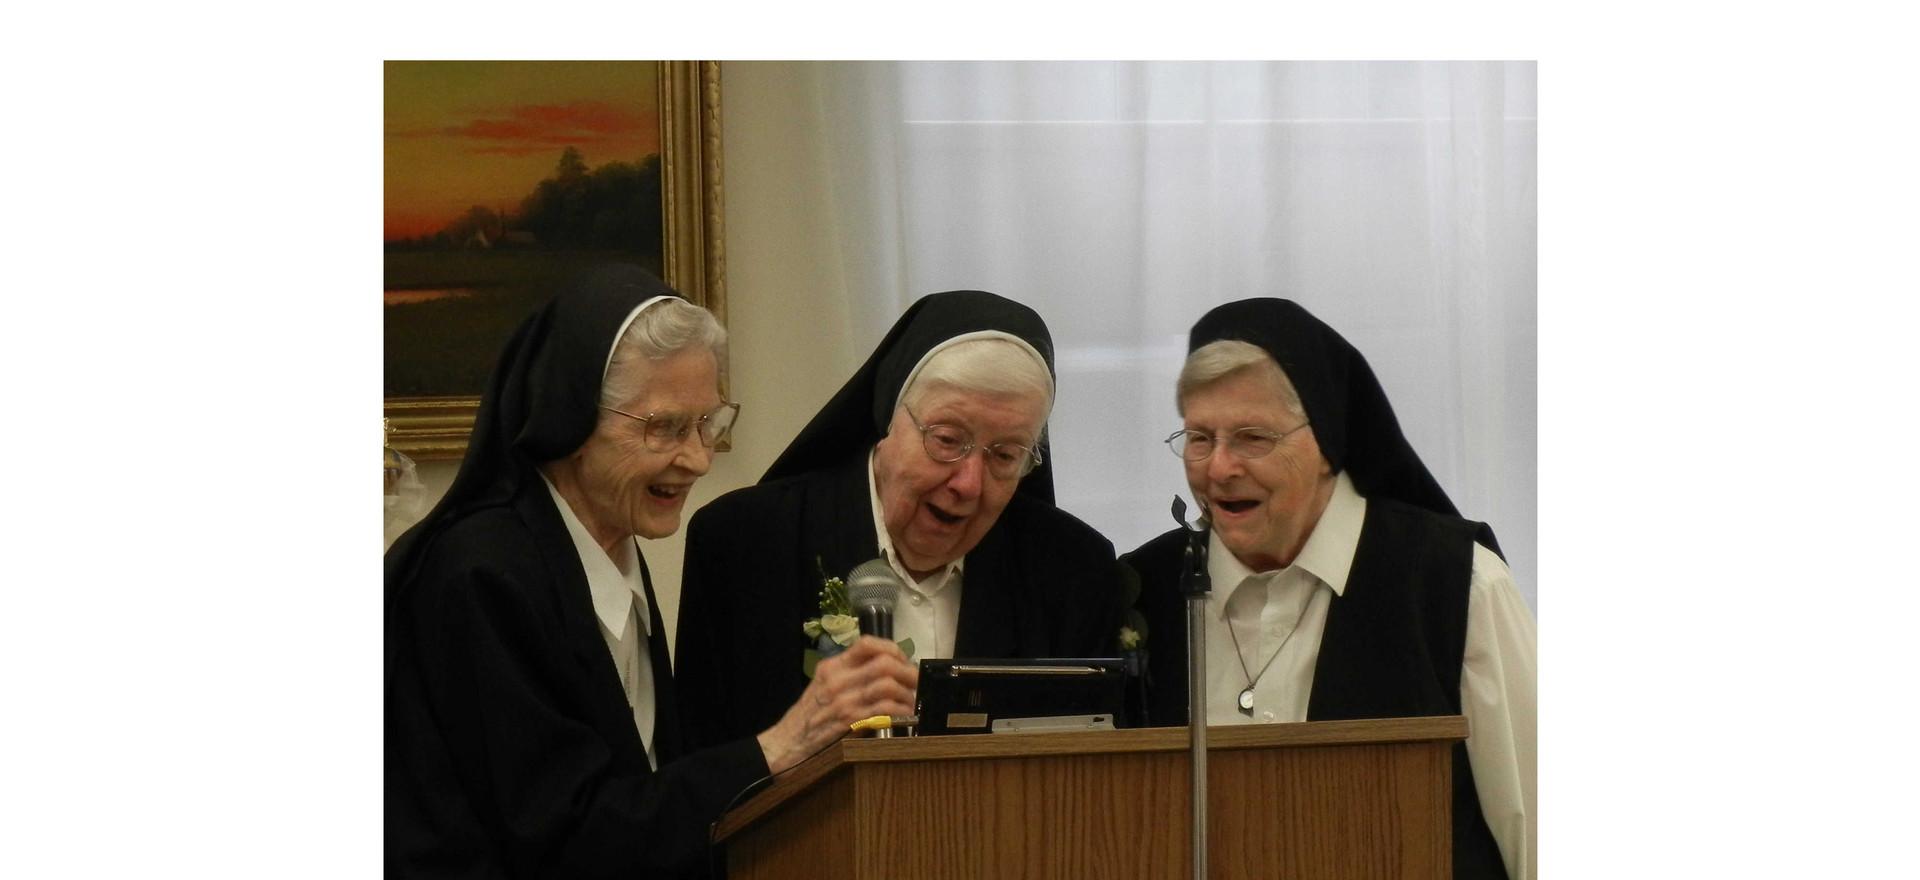 Karaoke Night in the convent